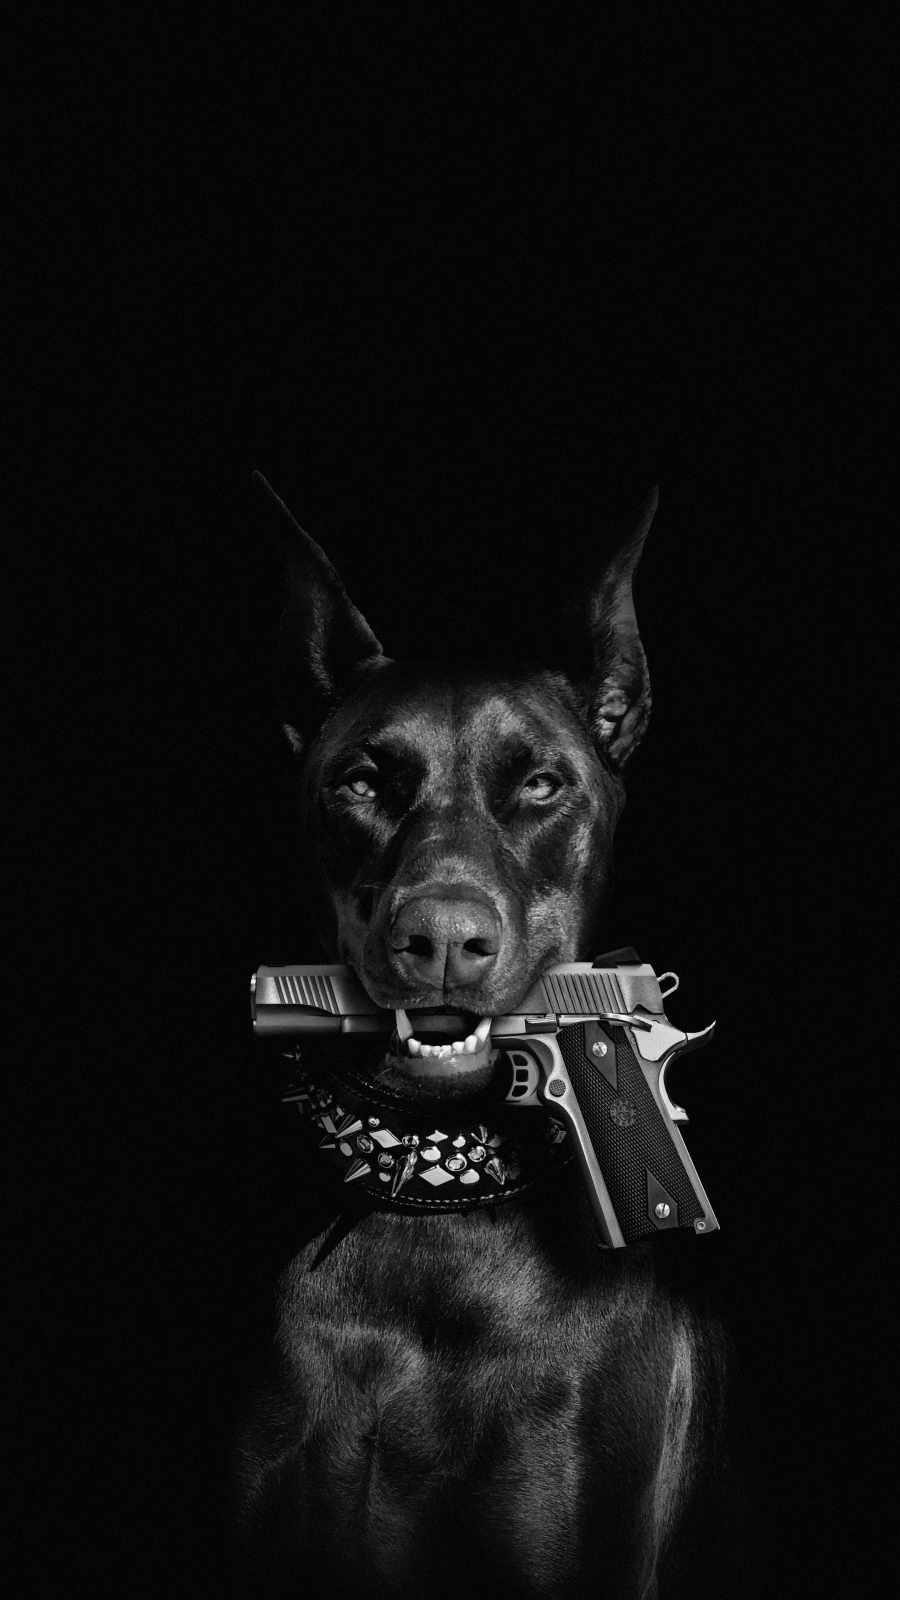 Dog with Gun iPhone Wallpaper